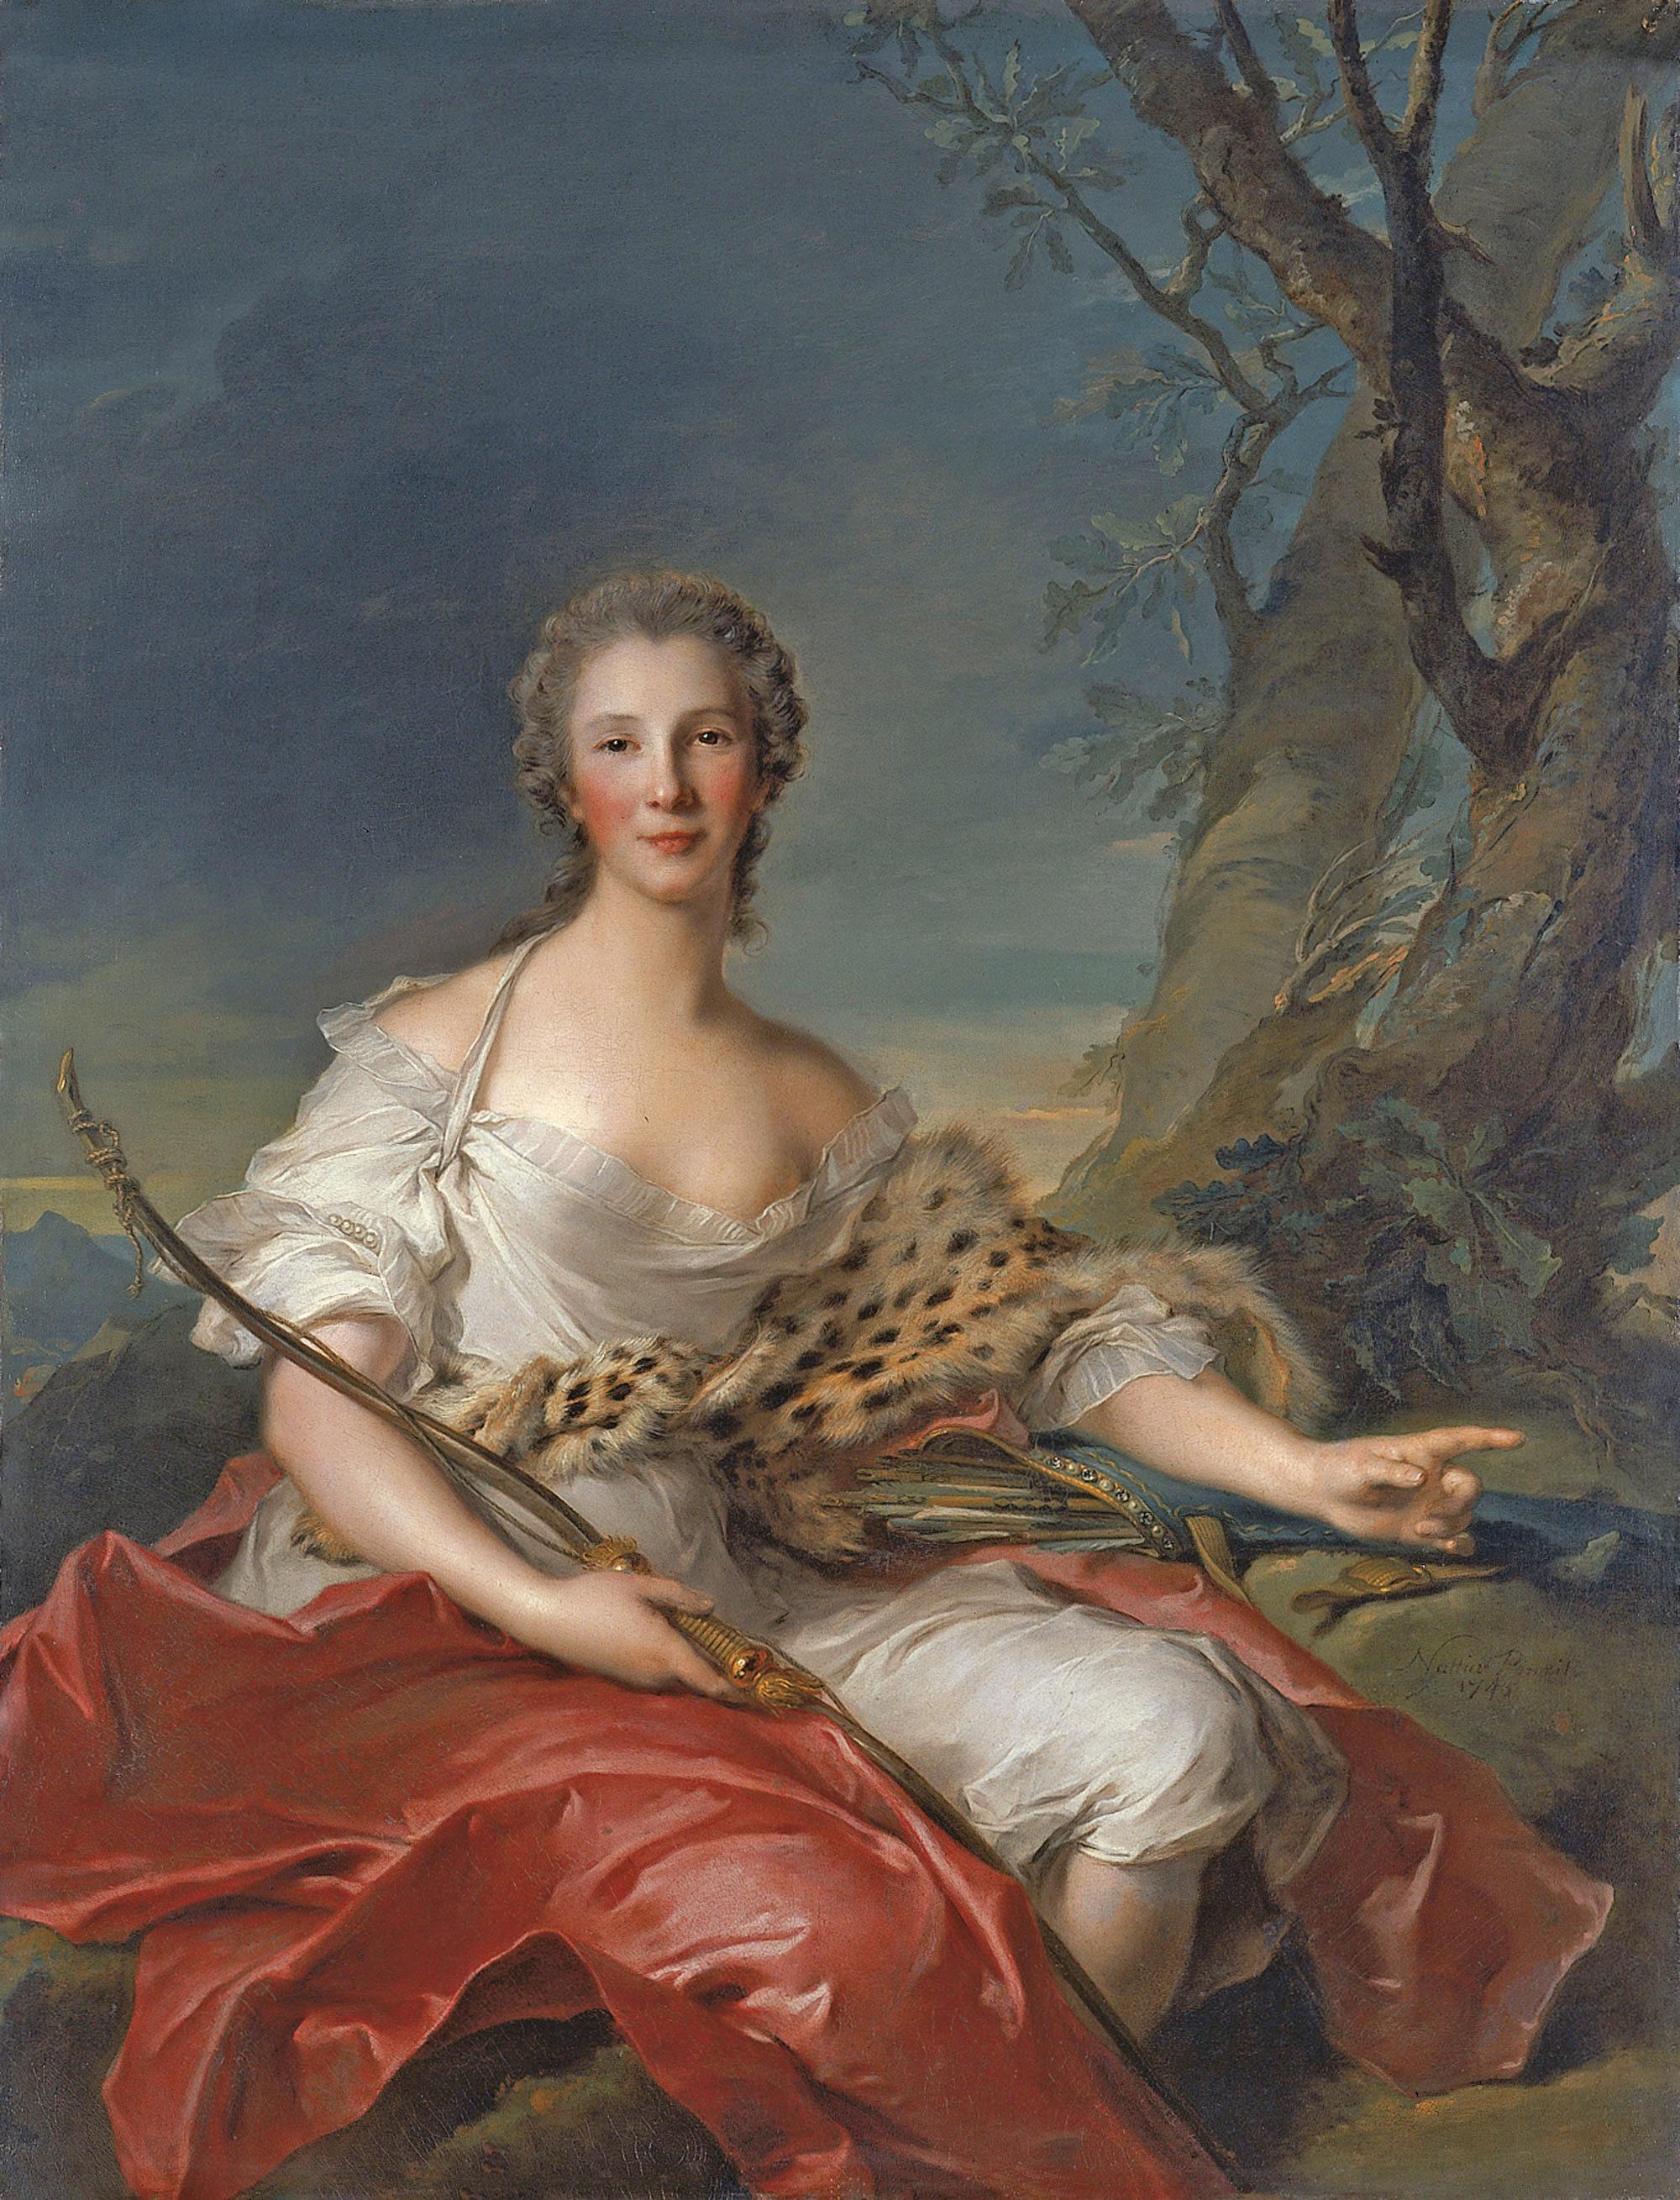 File:Jean-Marc Nattier, Retrato de Madame Bouret como Diana (1745)